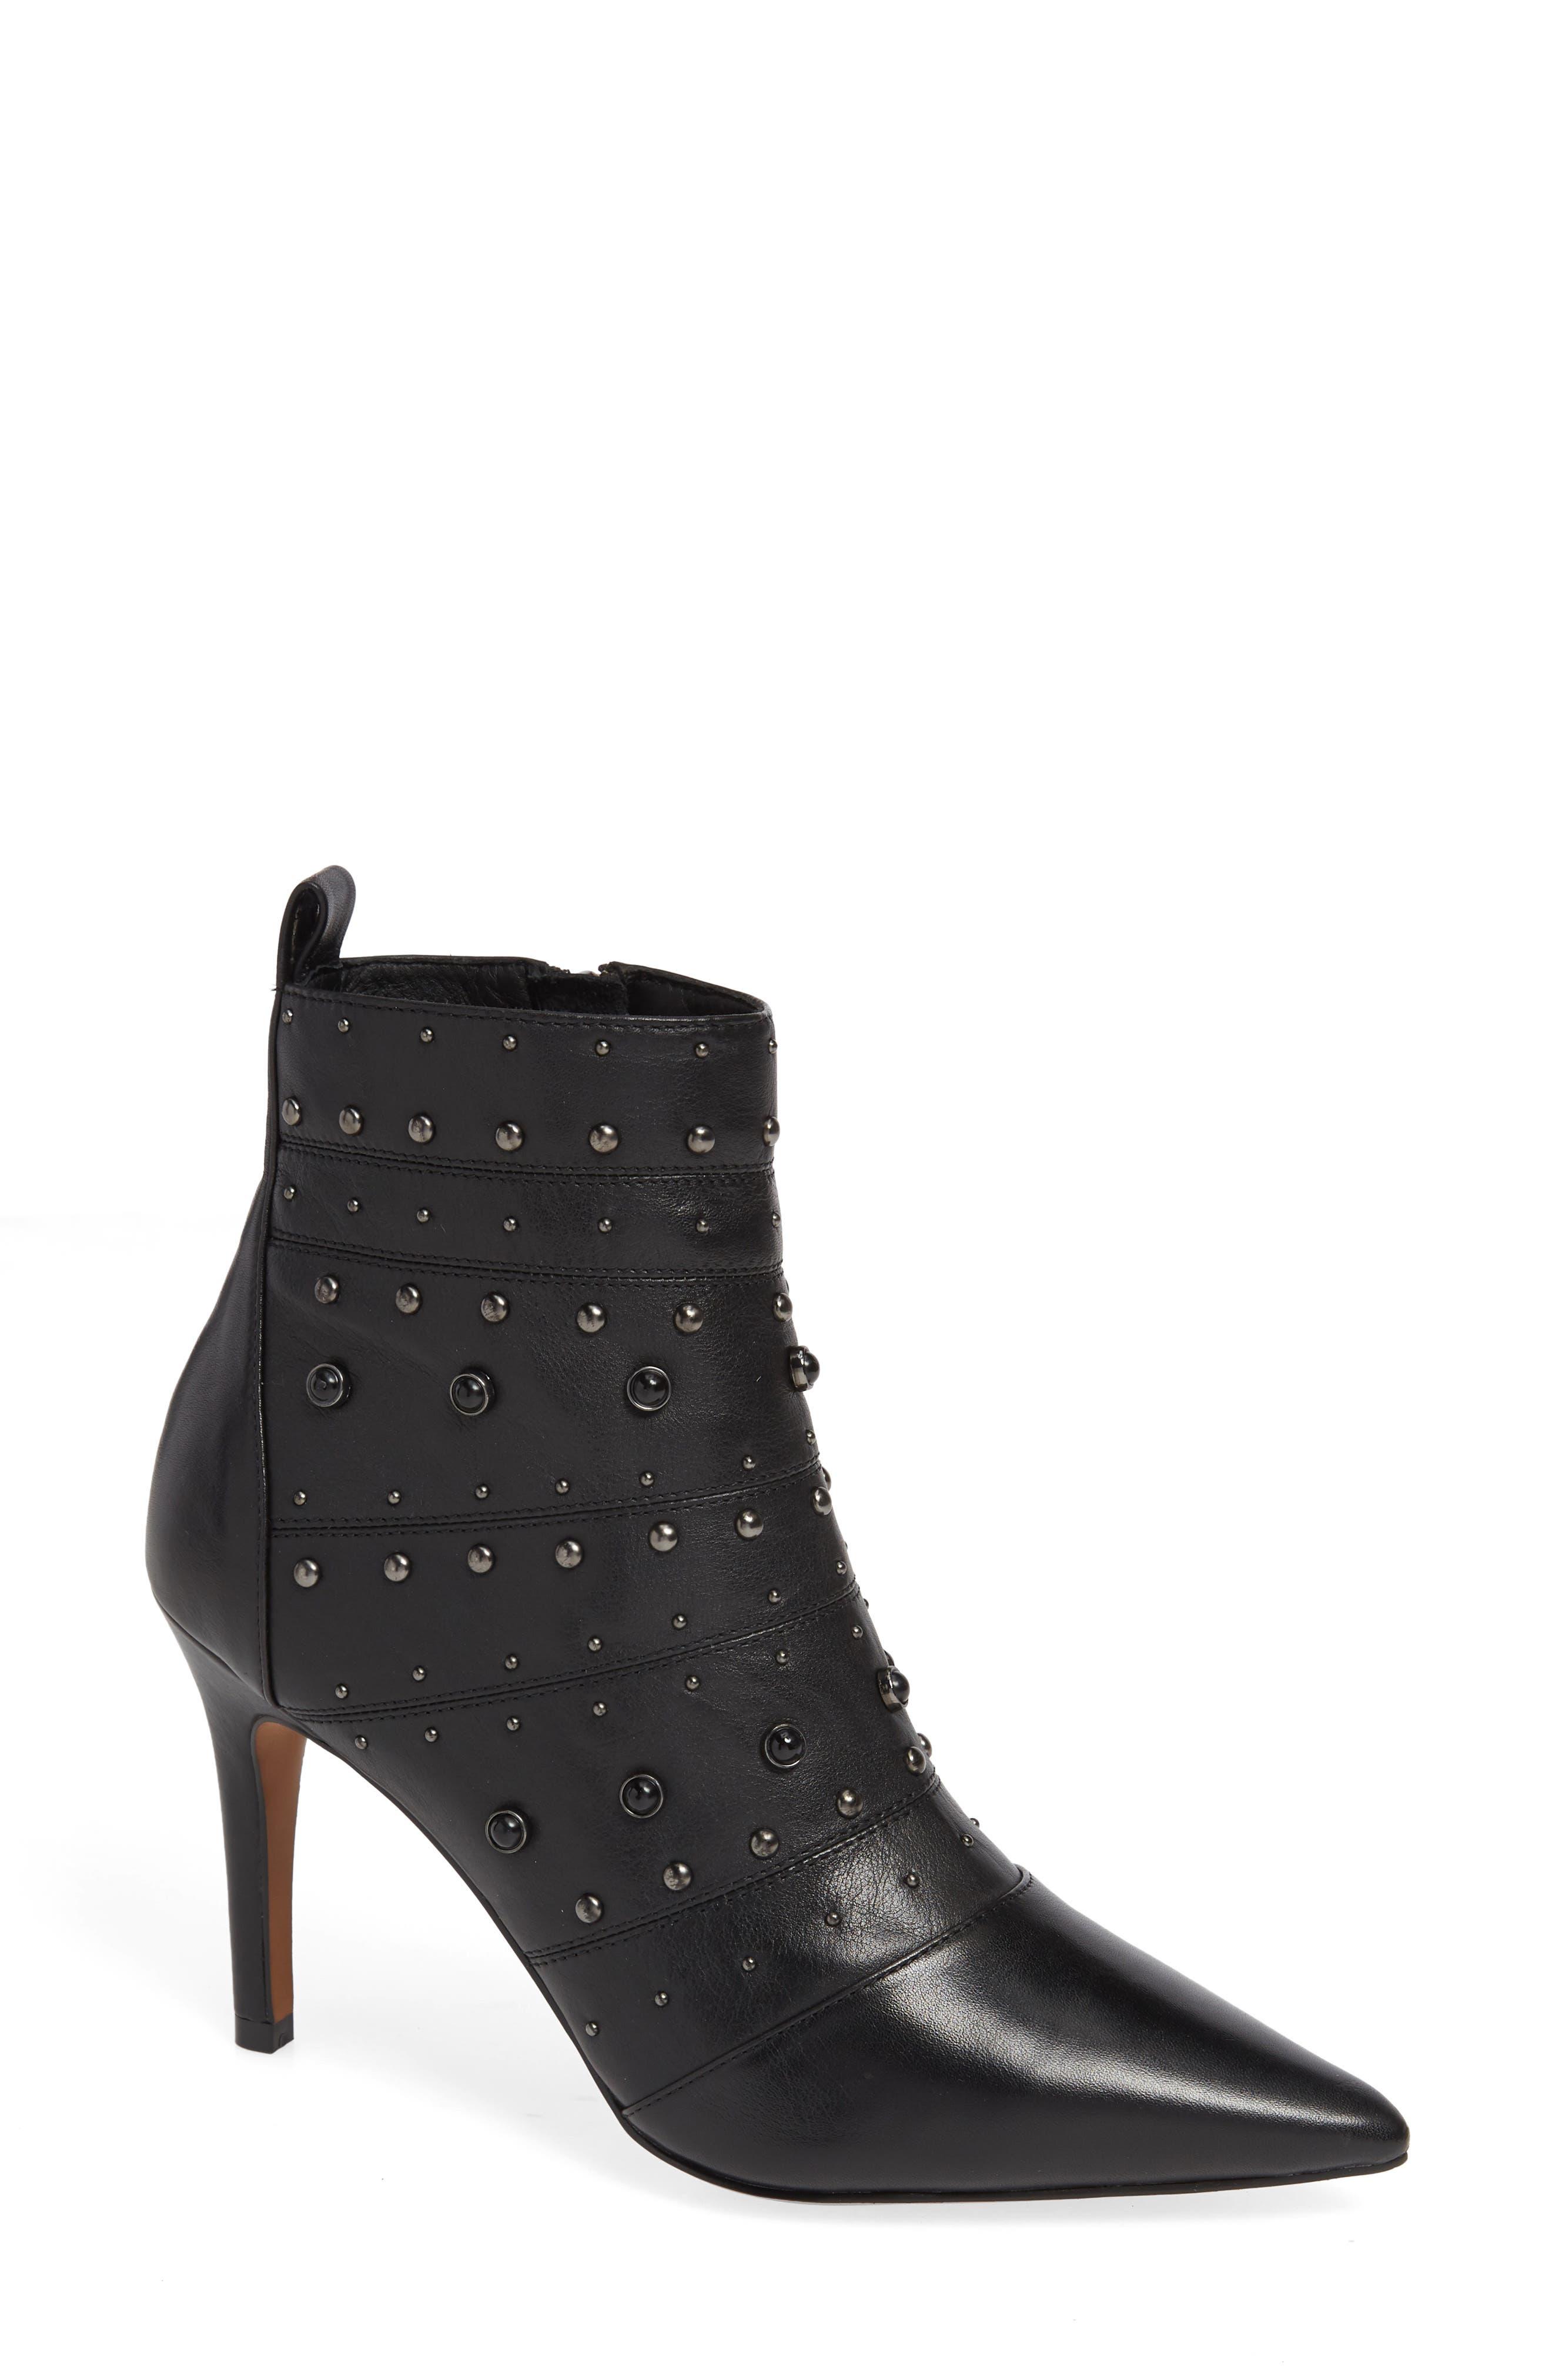 Linea Paolo Nara Studded Bootie- Black